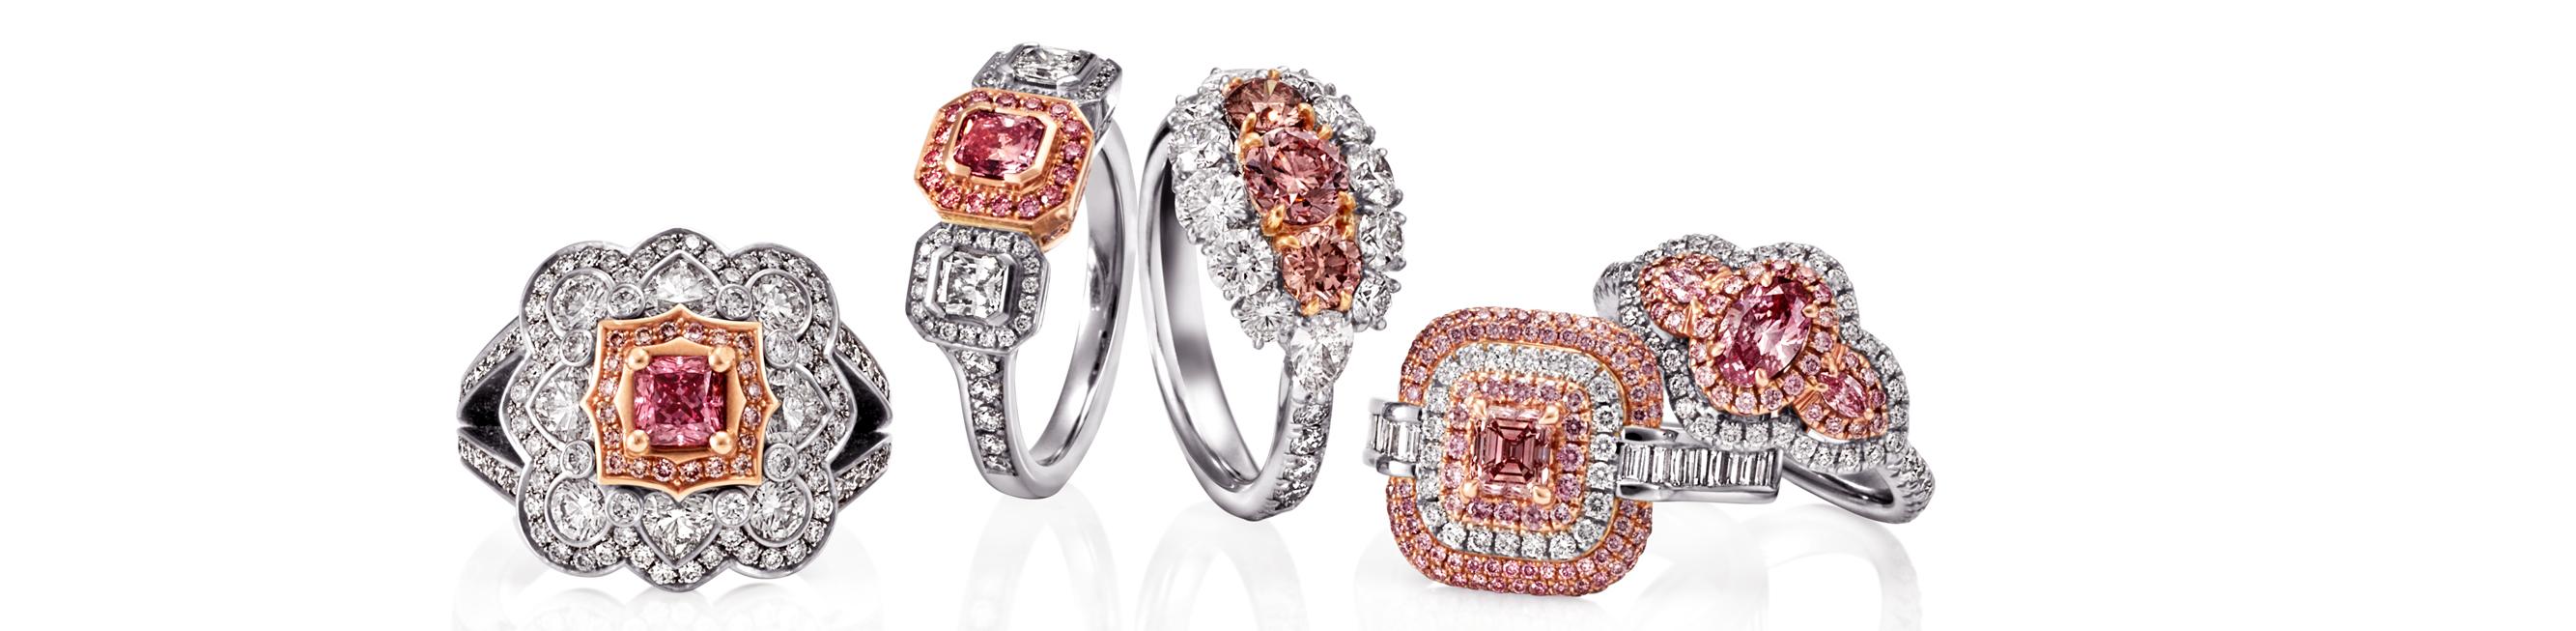 Stunning New Argyle Pink Diamond Rings - November 2020 News article hero image